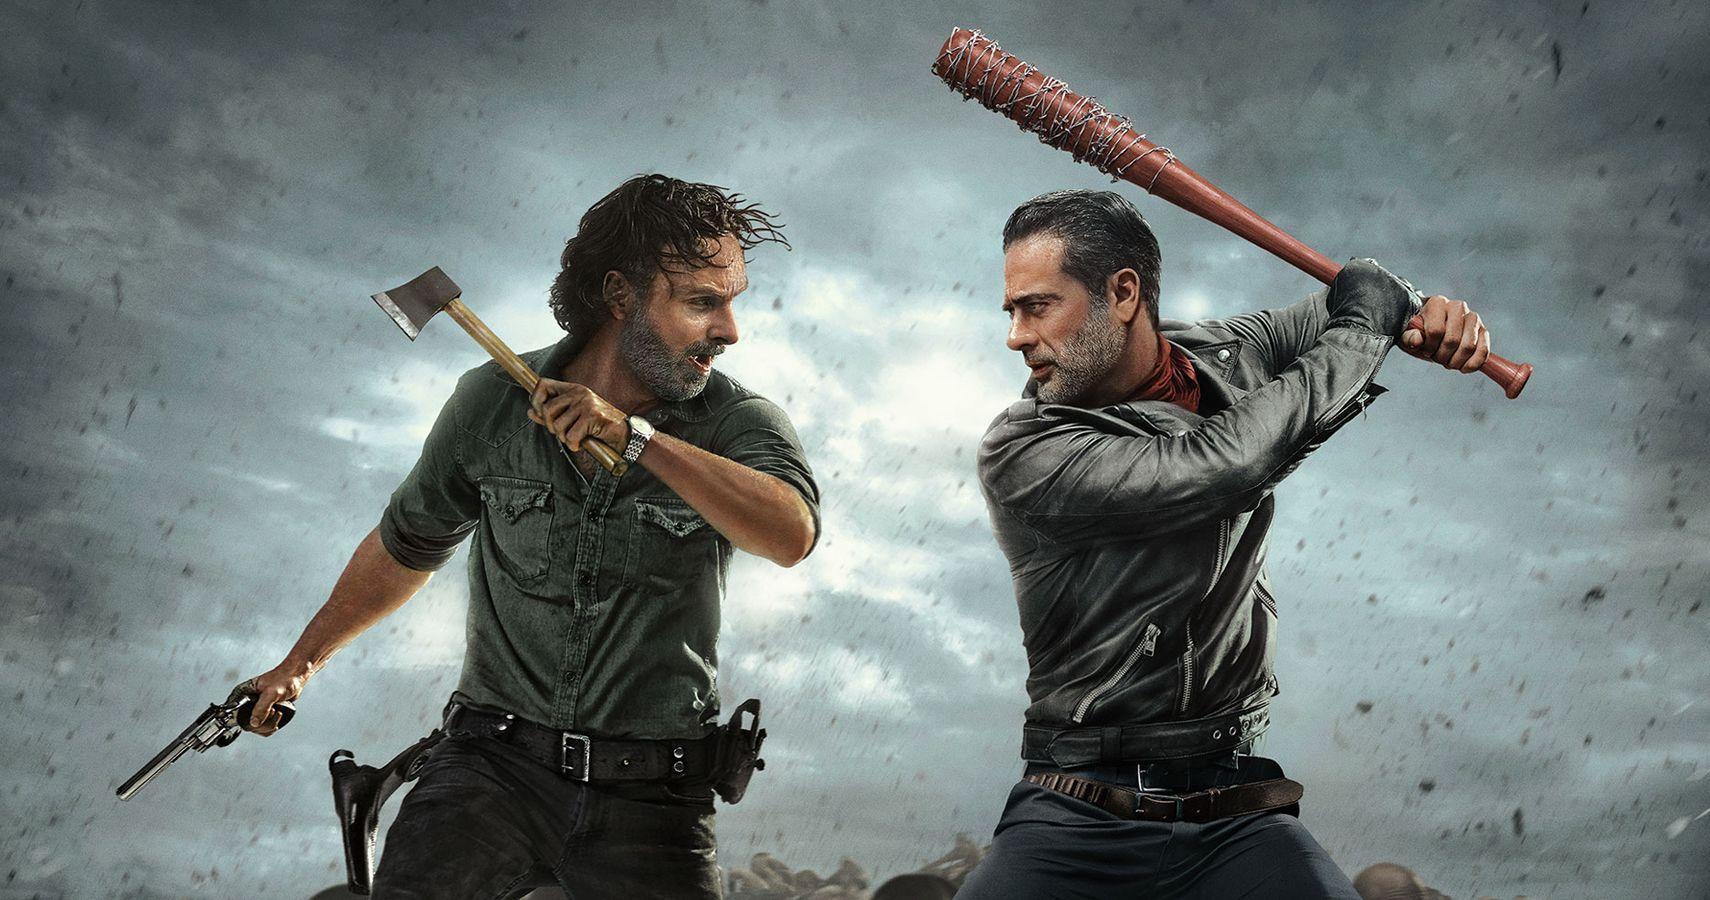 Ranked: Best Seasons Of The Walking Dead